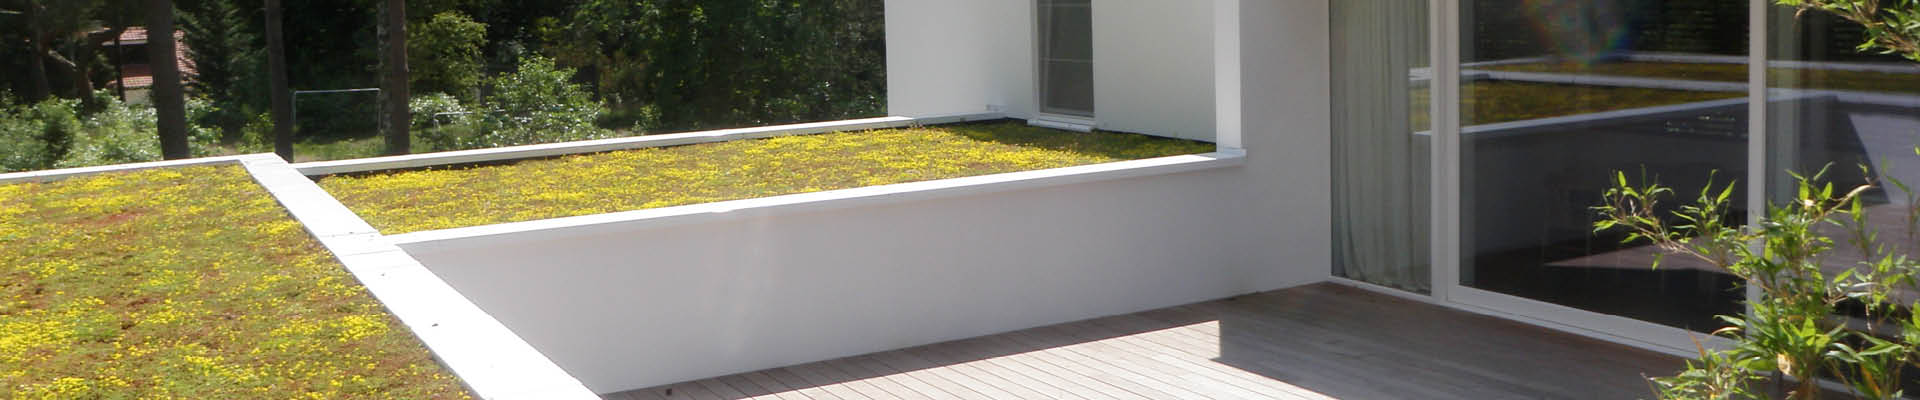 compact bouwen optimaliseer de woonruimte